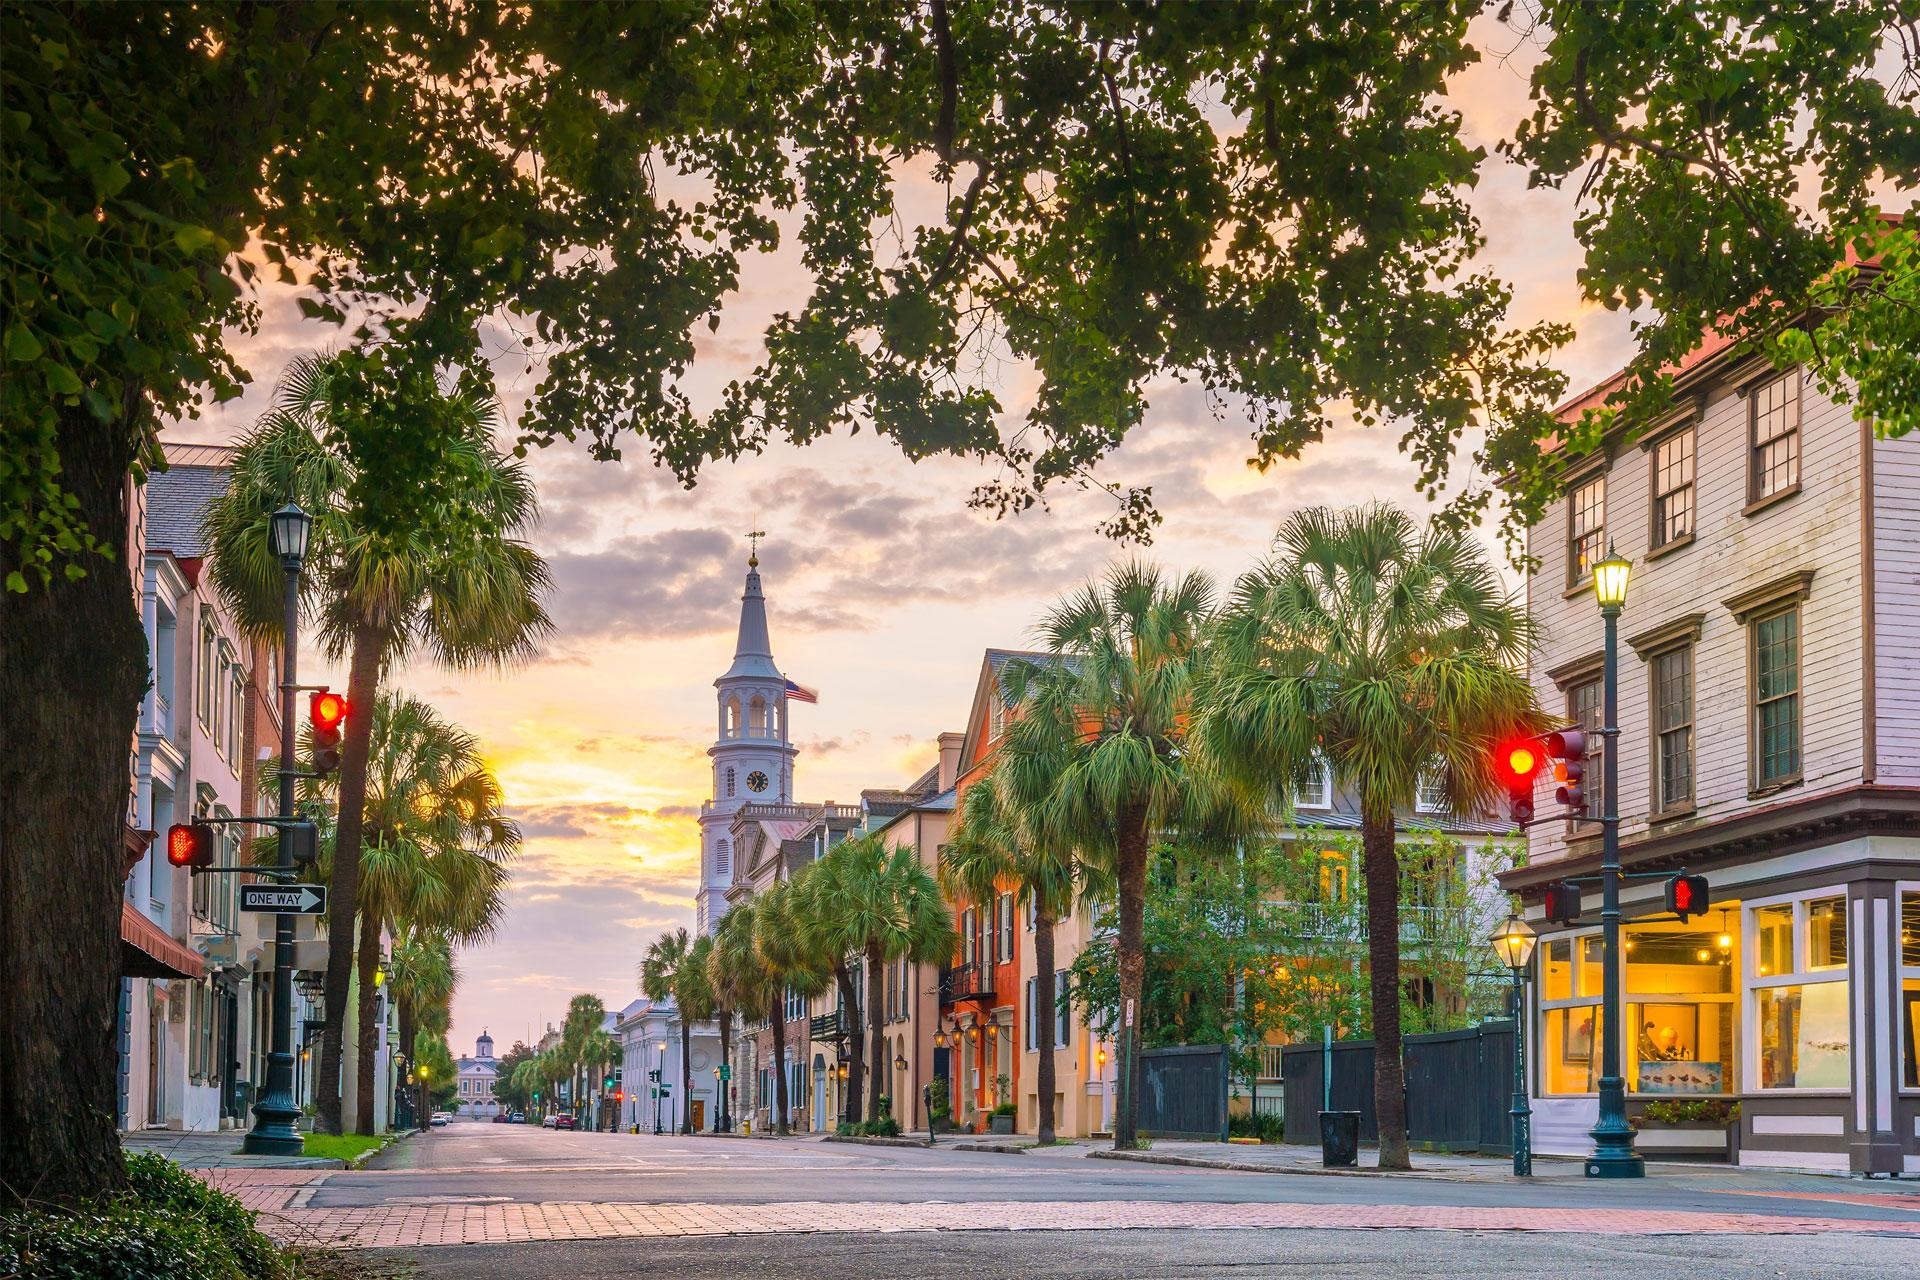 Charleston, South Carolina; Courtesy of f11photo/Shutterstock.com